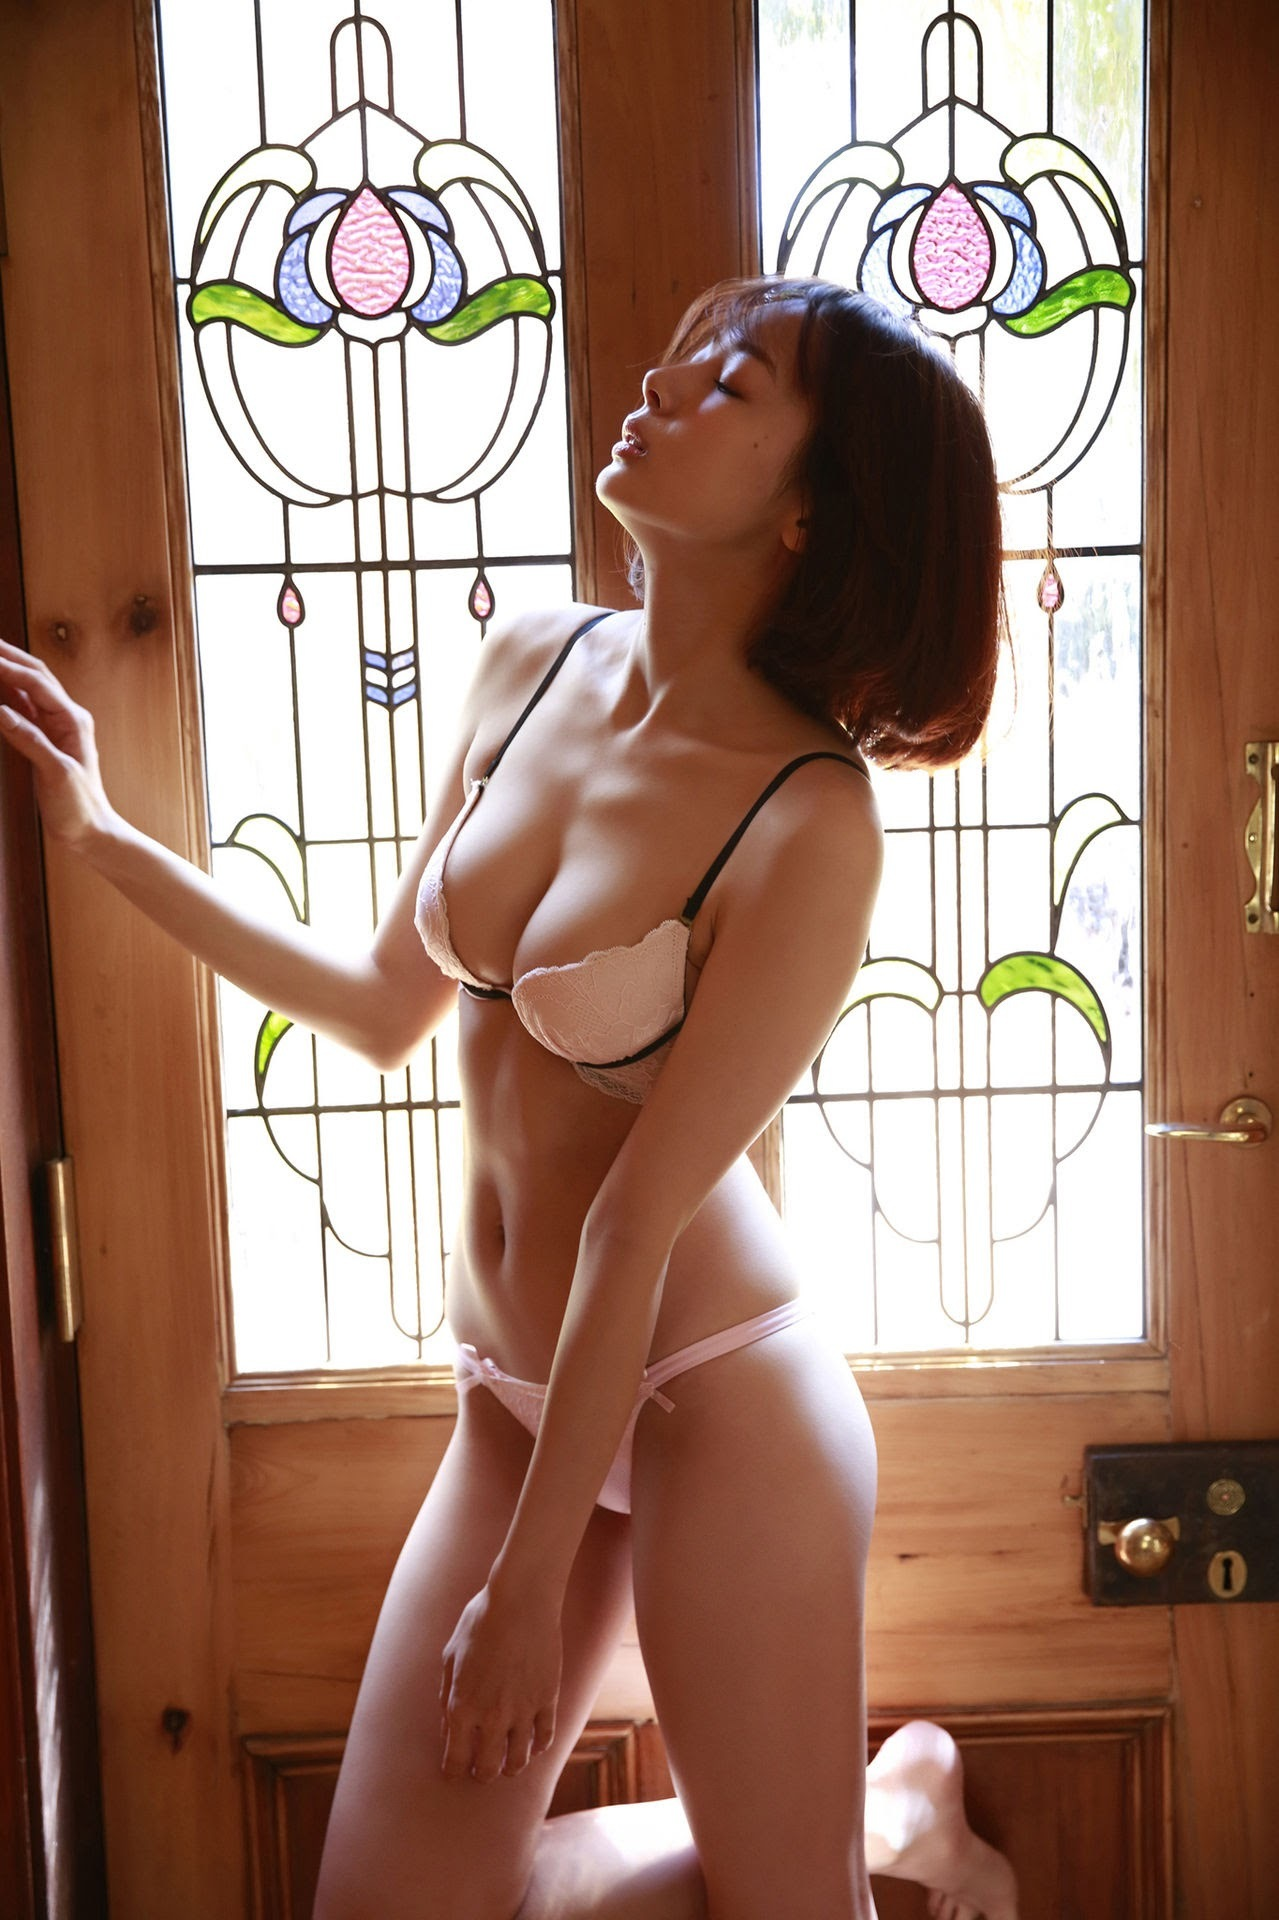 23 years old Shaka Okada, who is also a professional mahjong player036